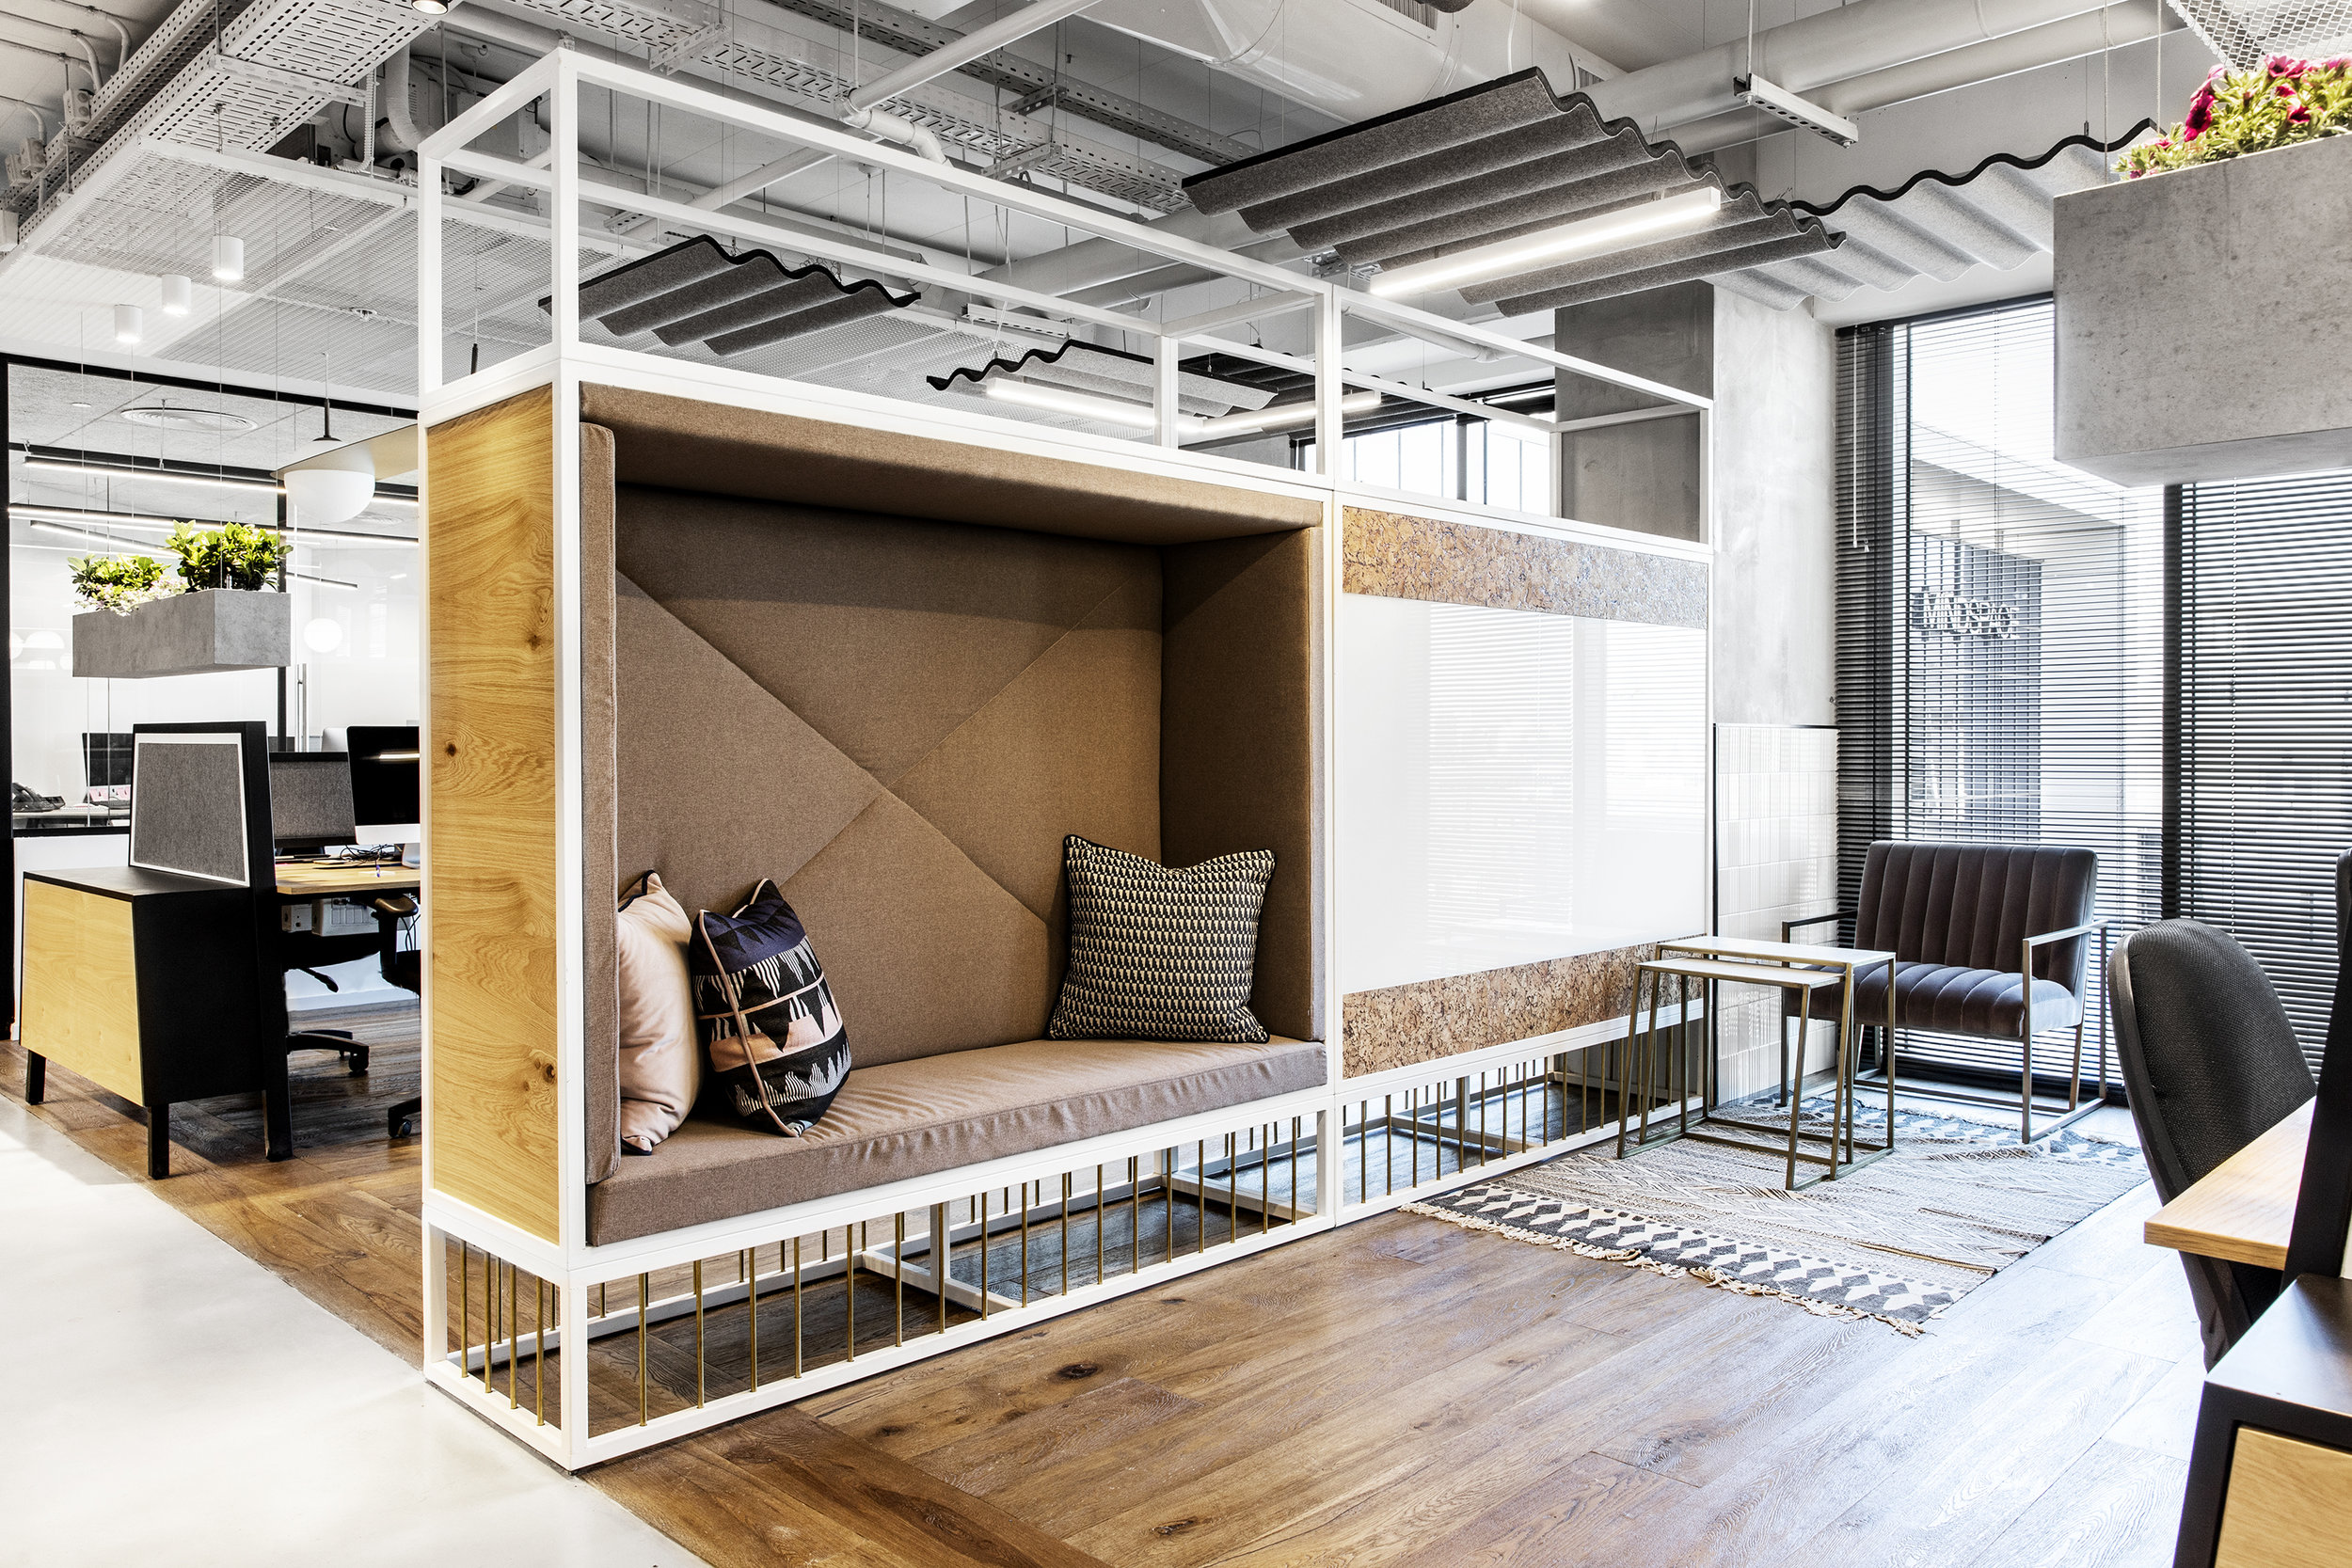 R2NET OFFICES - ROY DAVID ARCHITECTURE  STUDIO - רואי דוד אדריכלות סטודיו אדריכלים - אר2נט (28).jpg